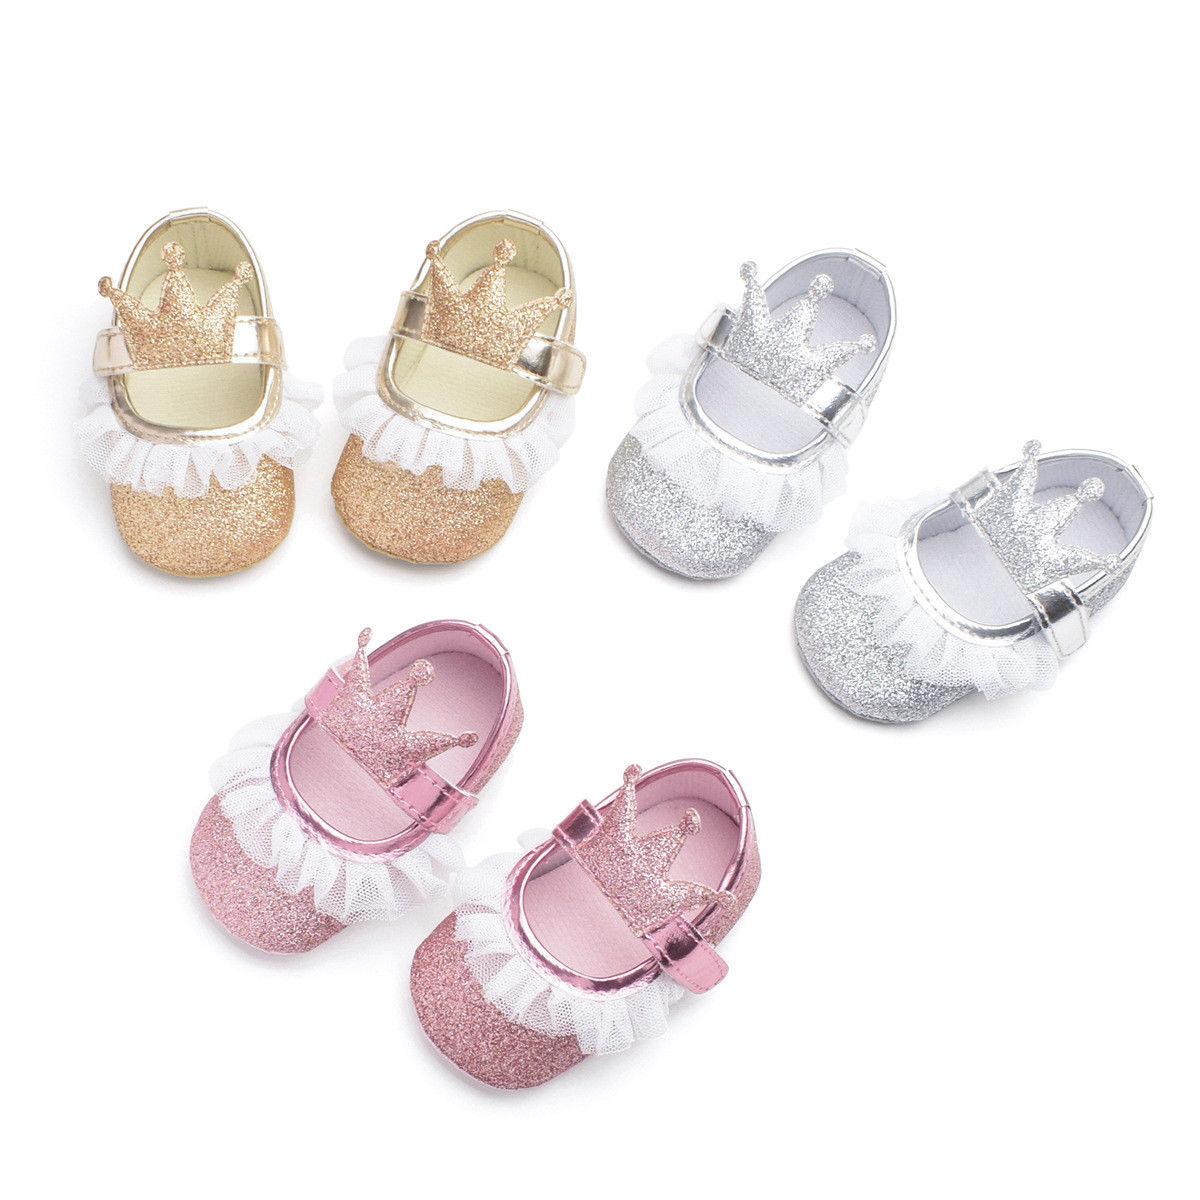 Littleoneshoes Soft Sole Baby Kids Shoe Prewalk Boy Gift Toddler Dinosaur 0-6M